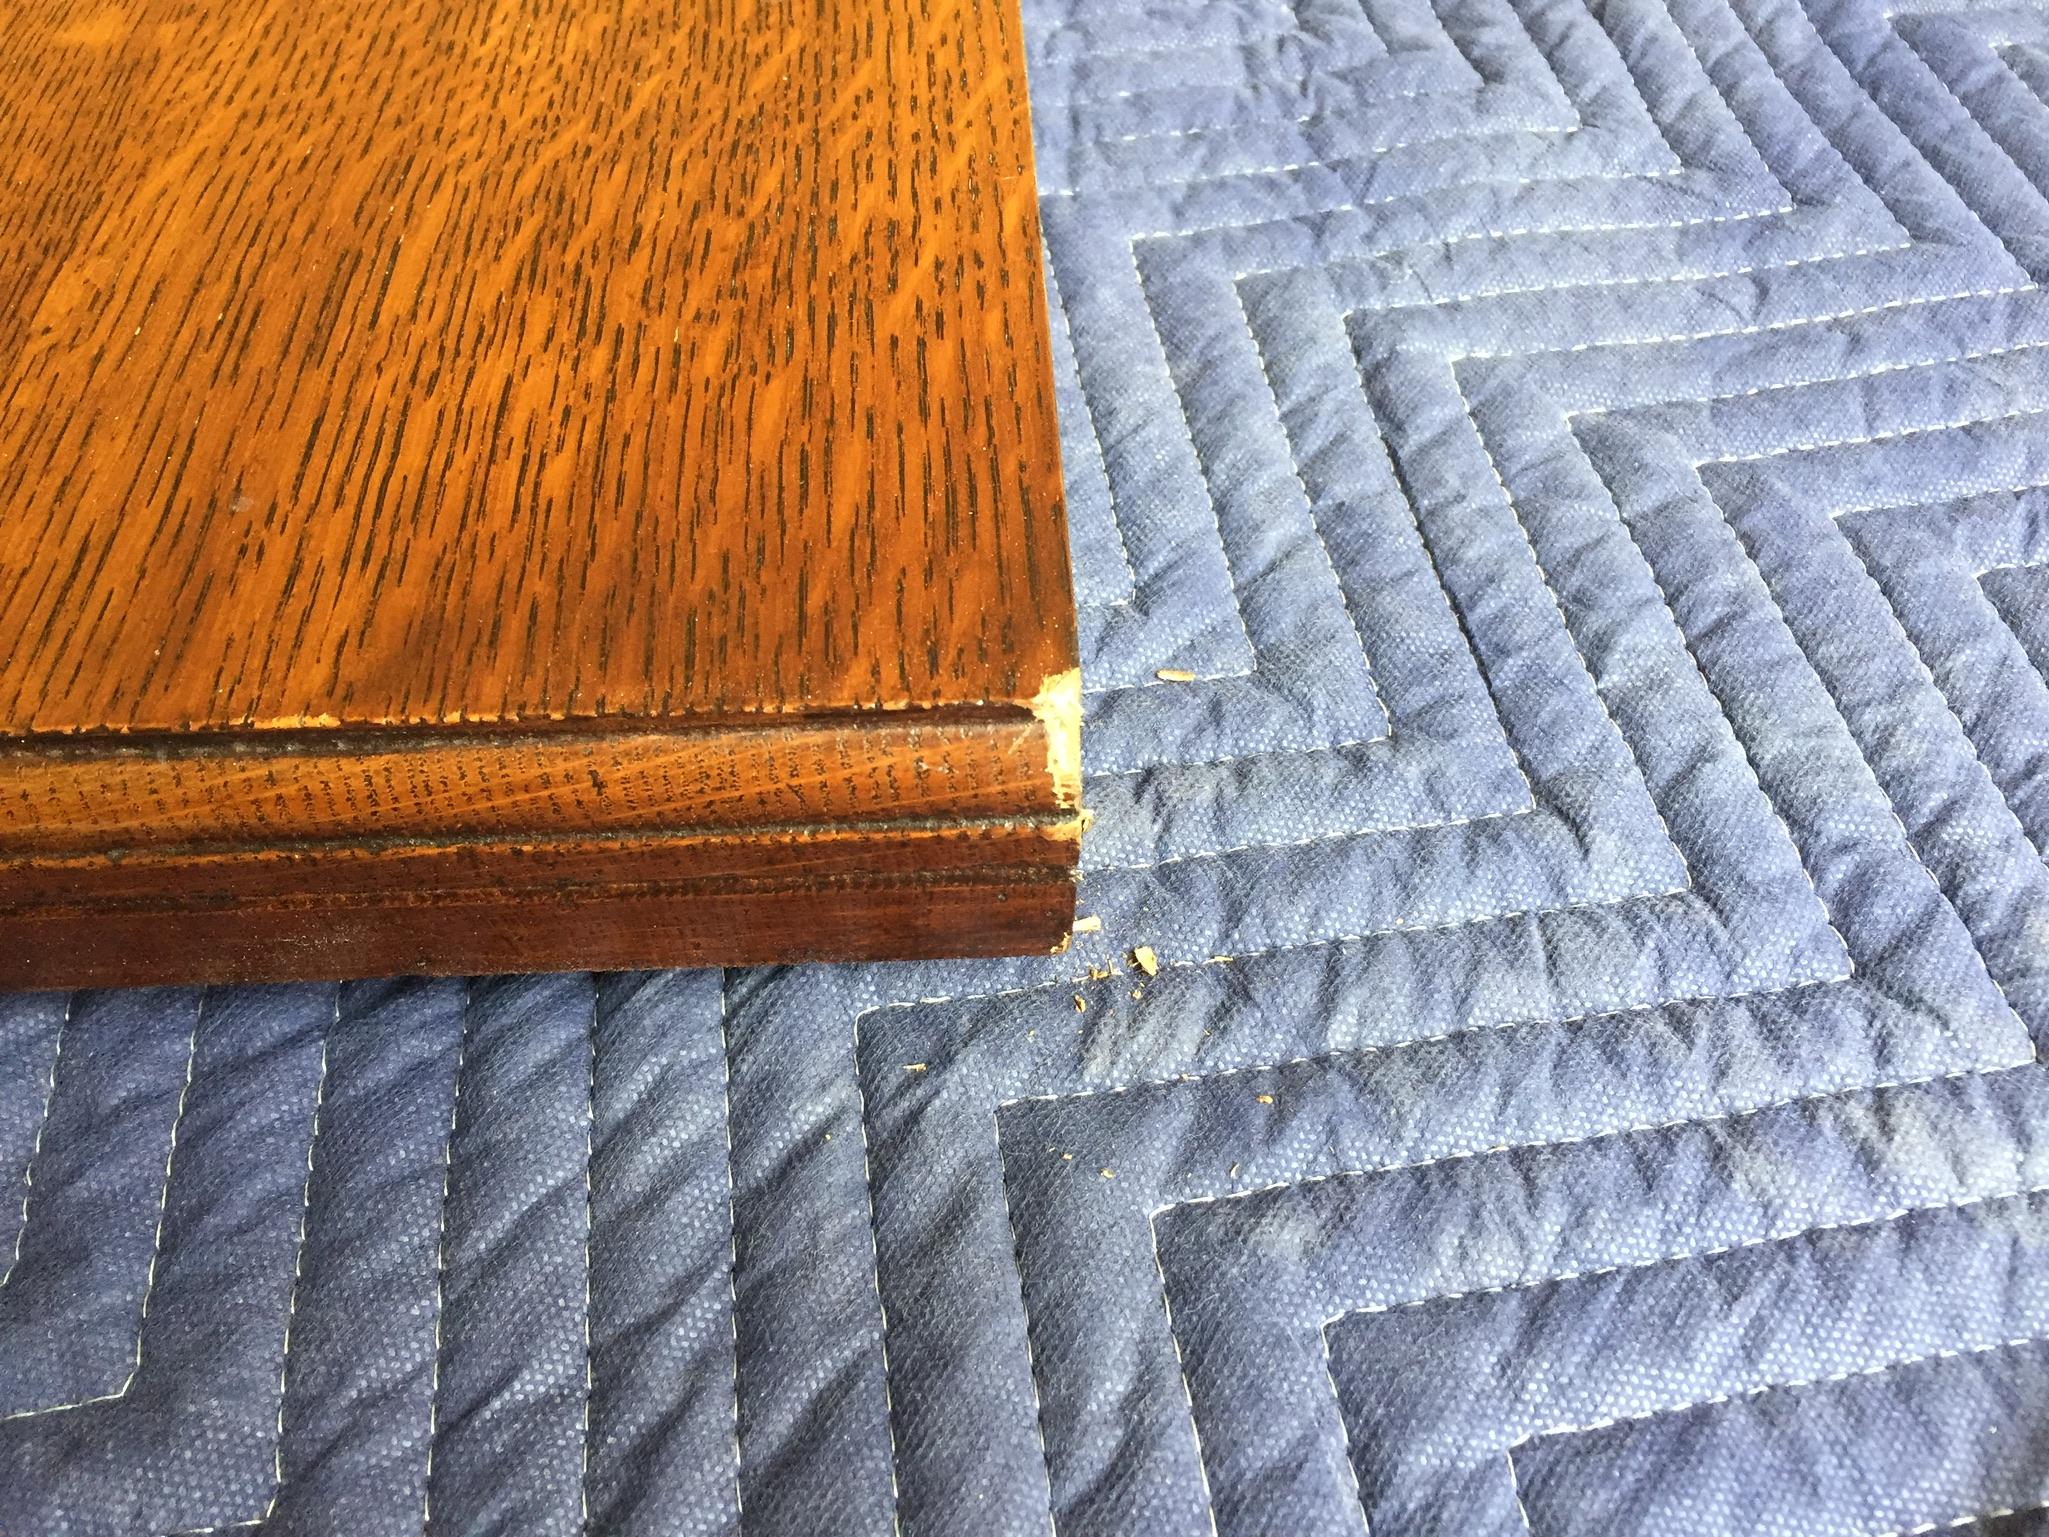 - Table leaf damage